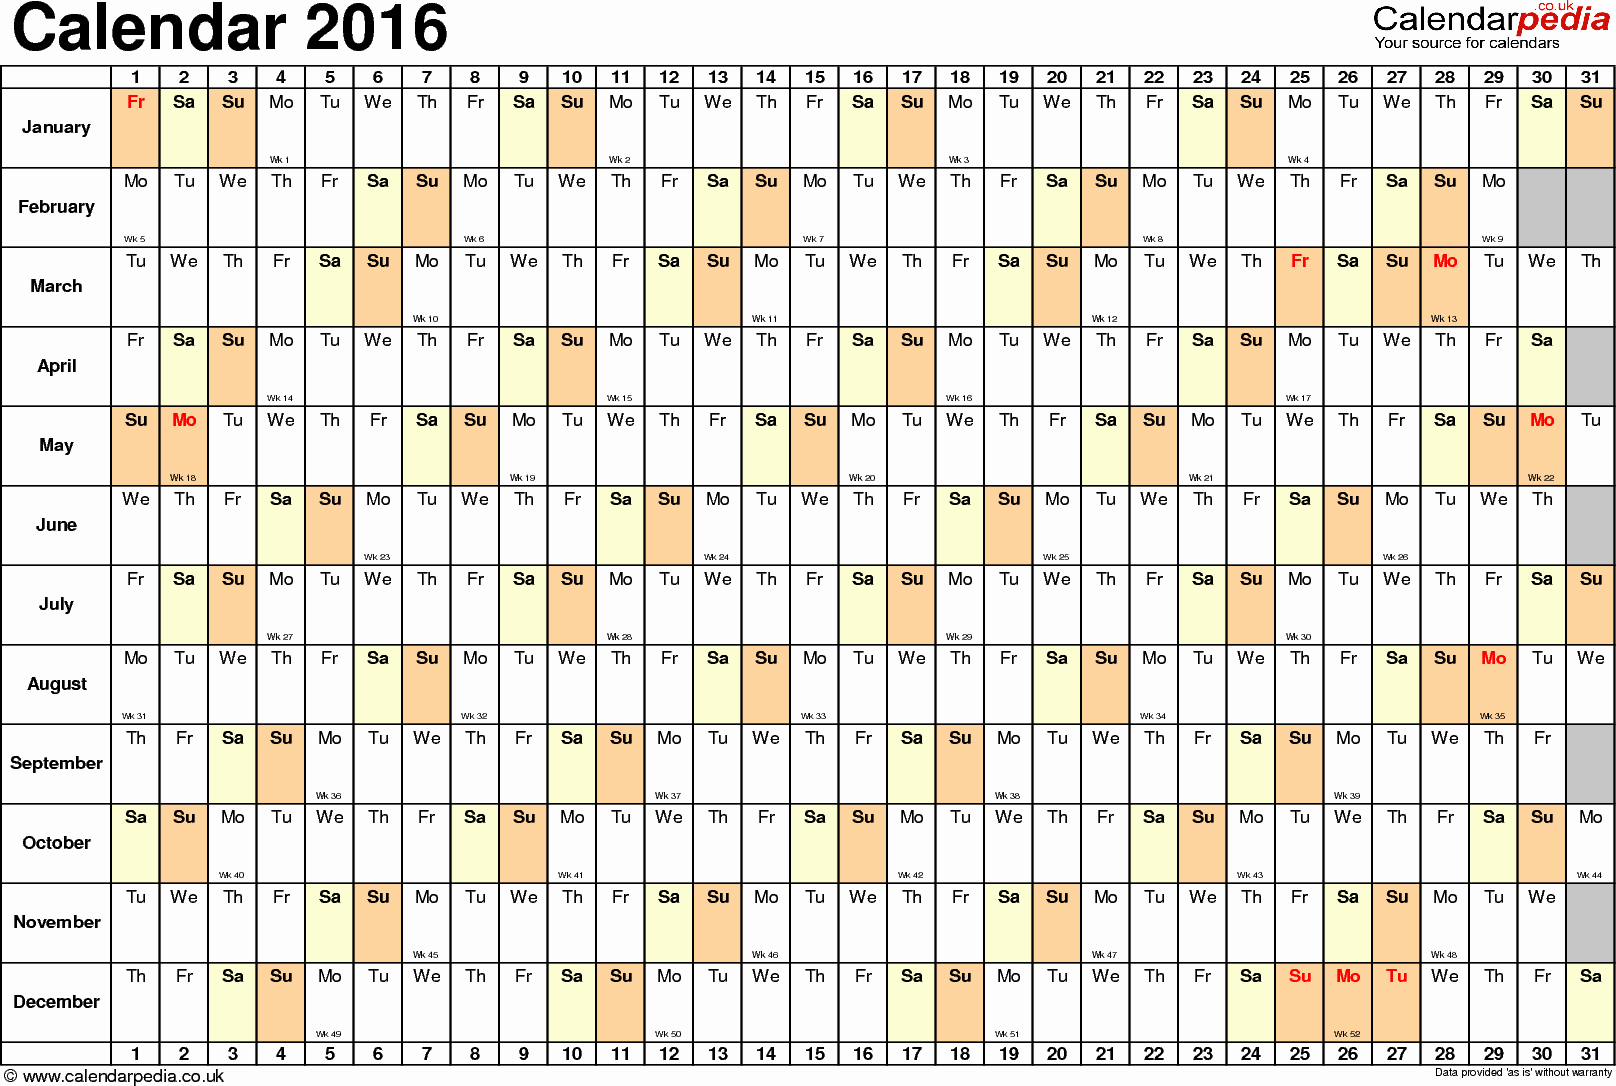 2015 Yearly Calendar Printable Landscape Unique December 2016 Calendar Landscape – 2017 Printable Calendar